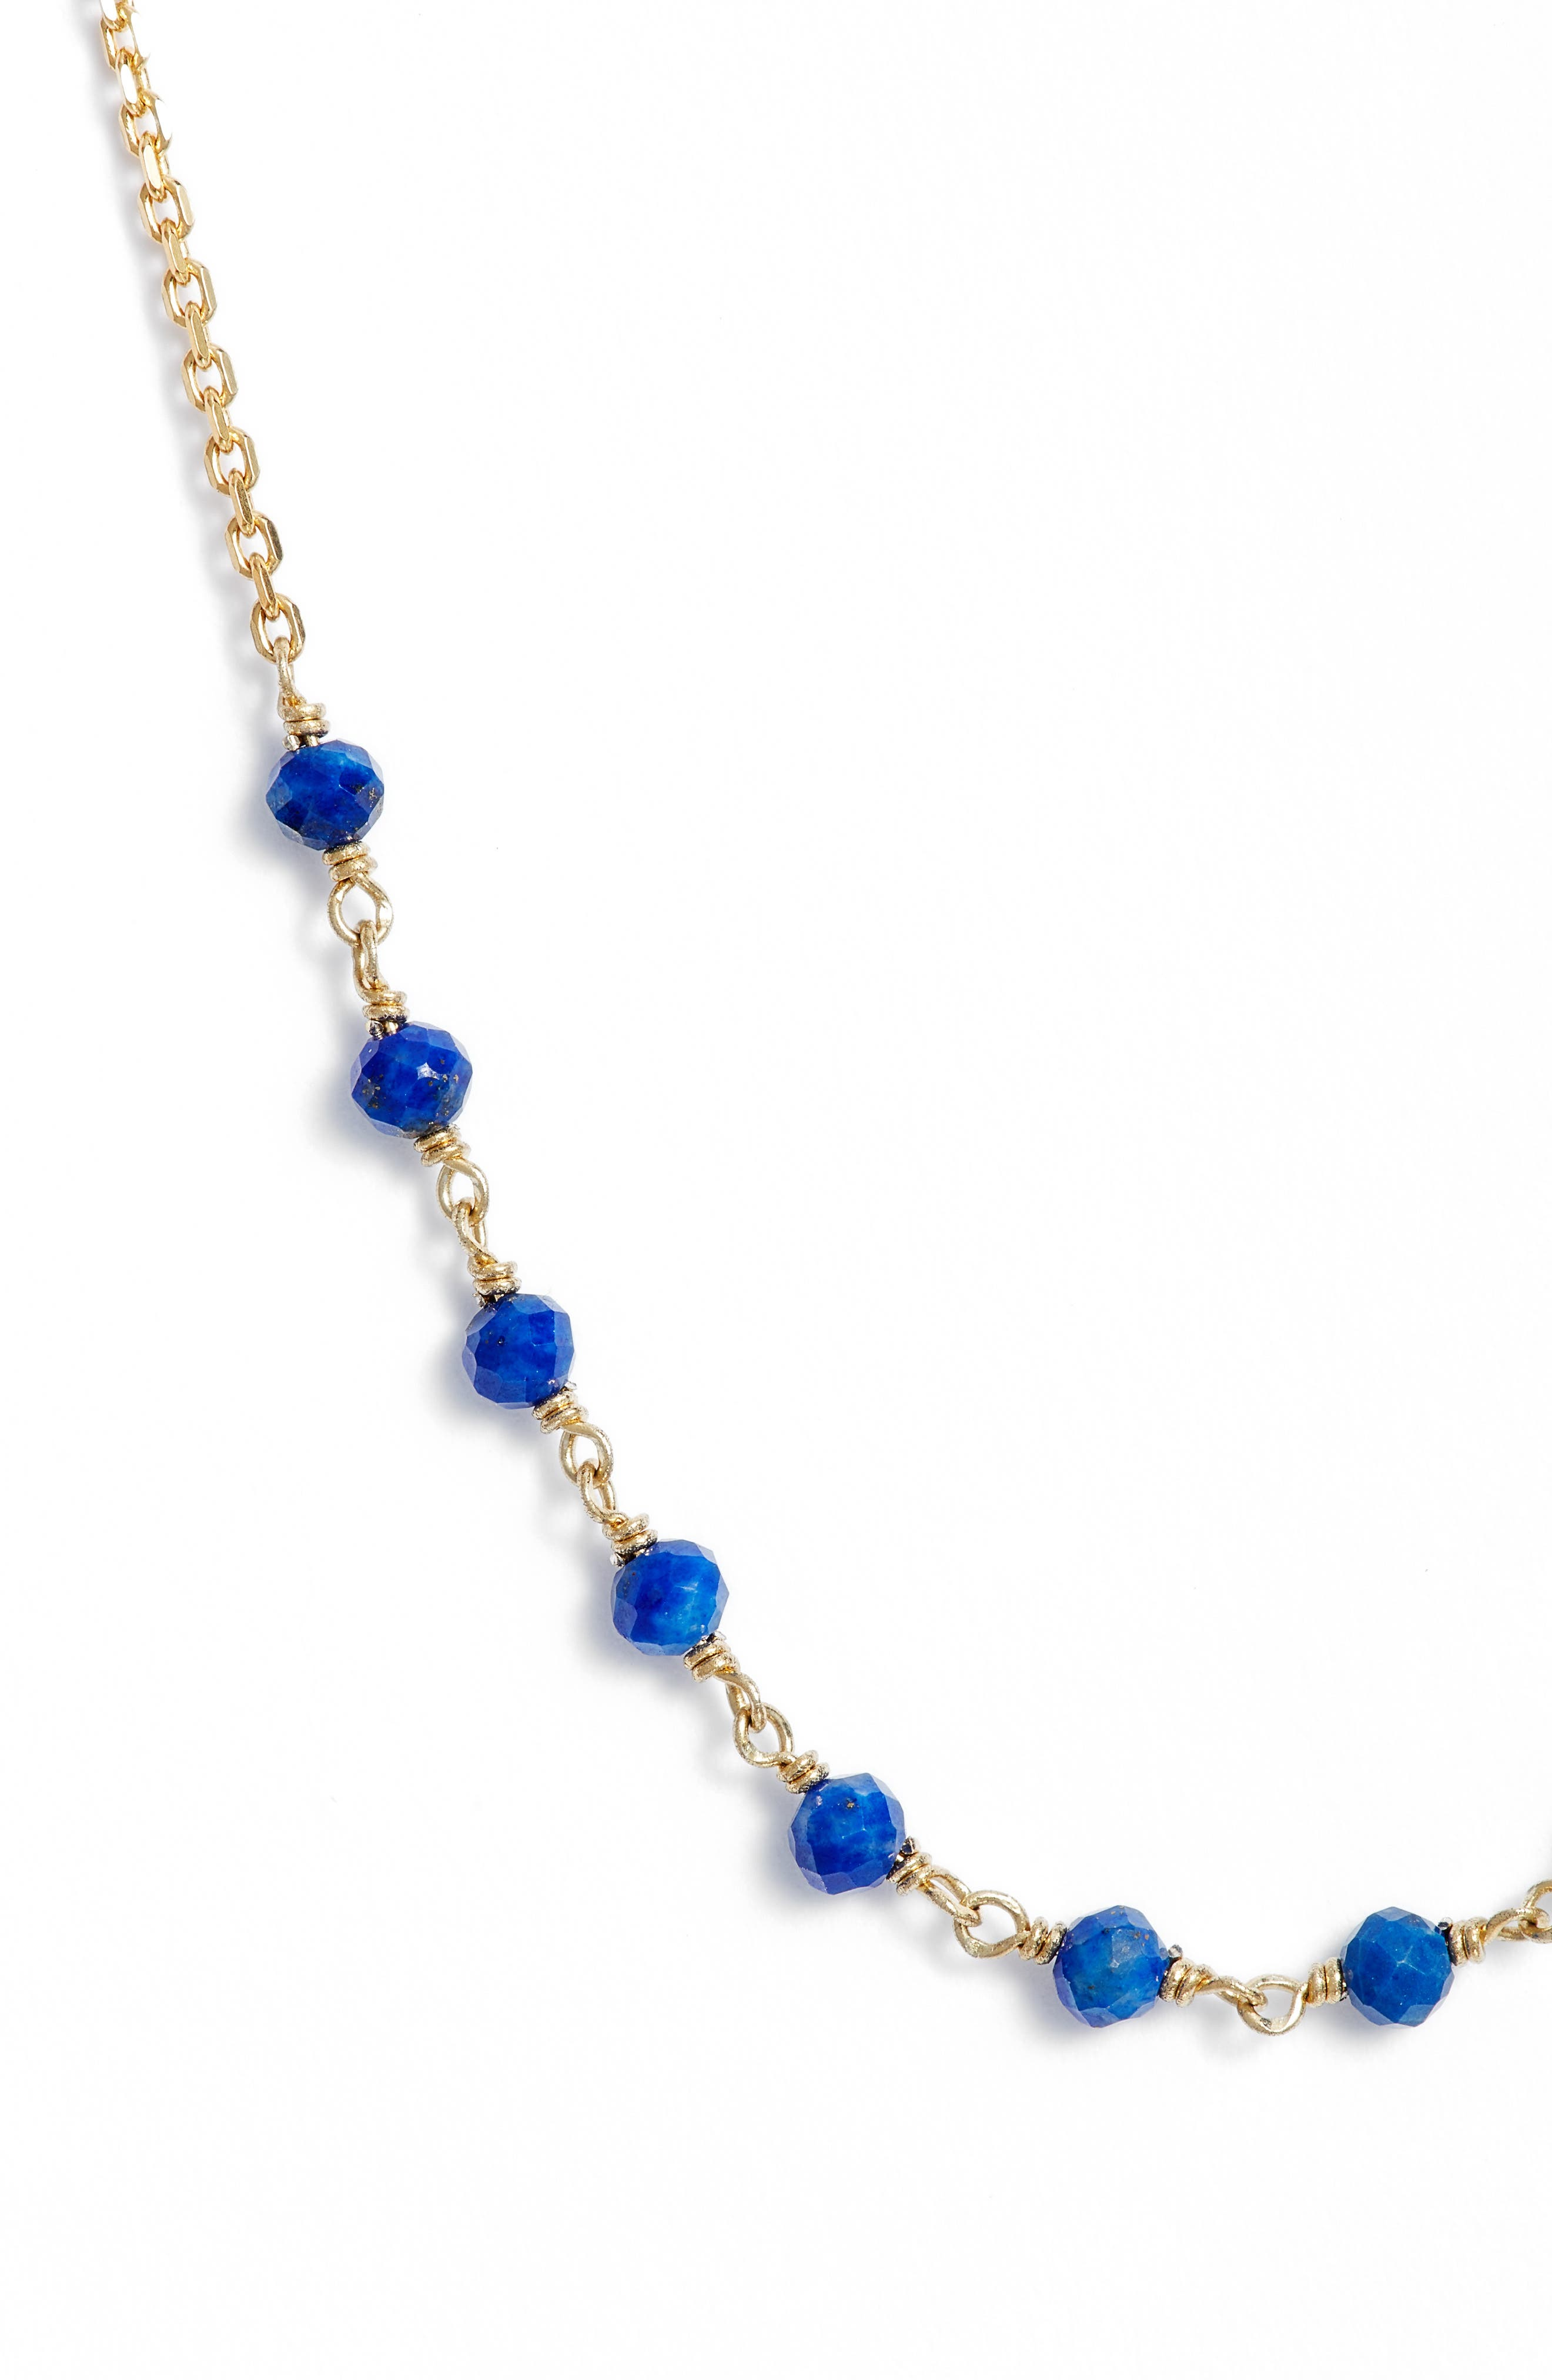 Gold & Bead Necklace,                             Alternate thumbnail 2, color,                             Gold/ Lapis